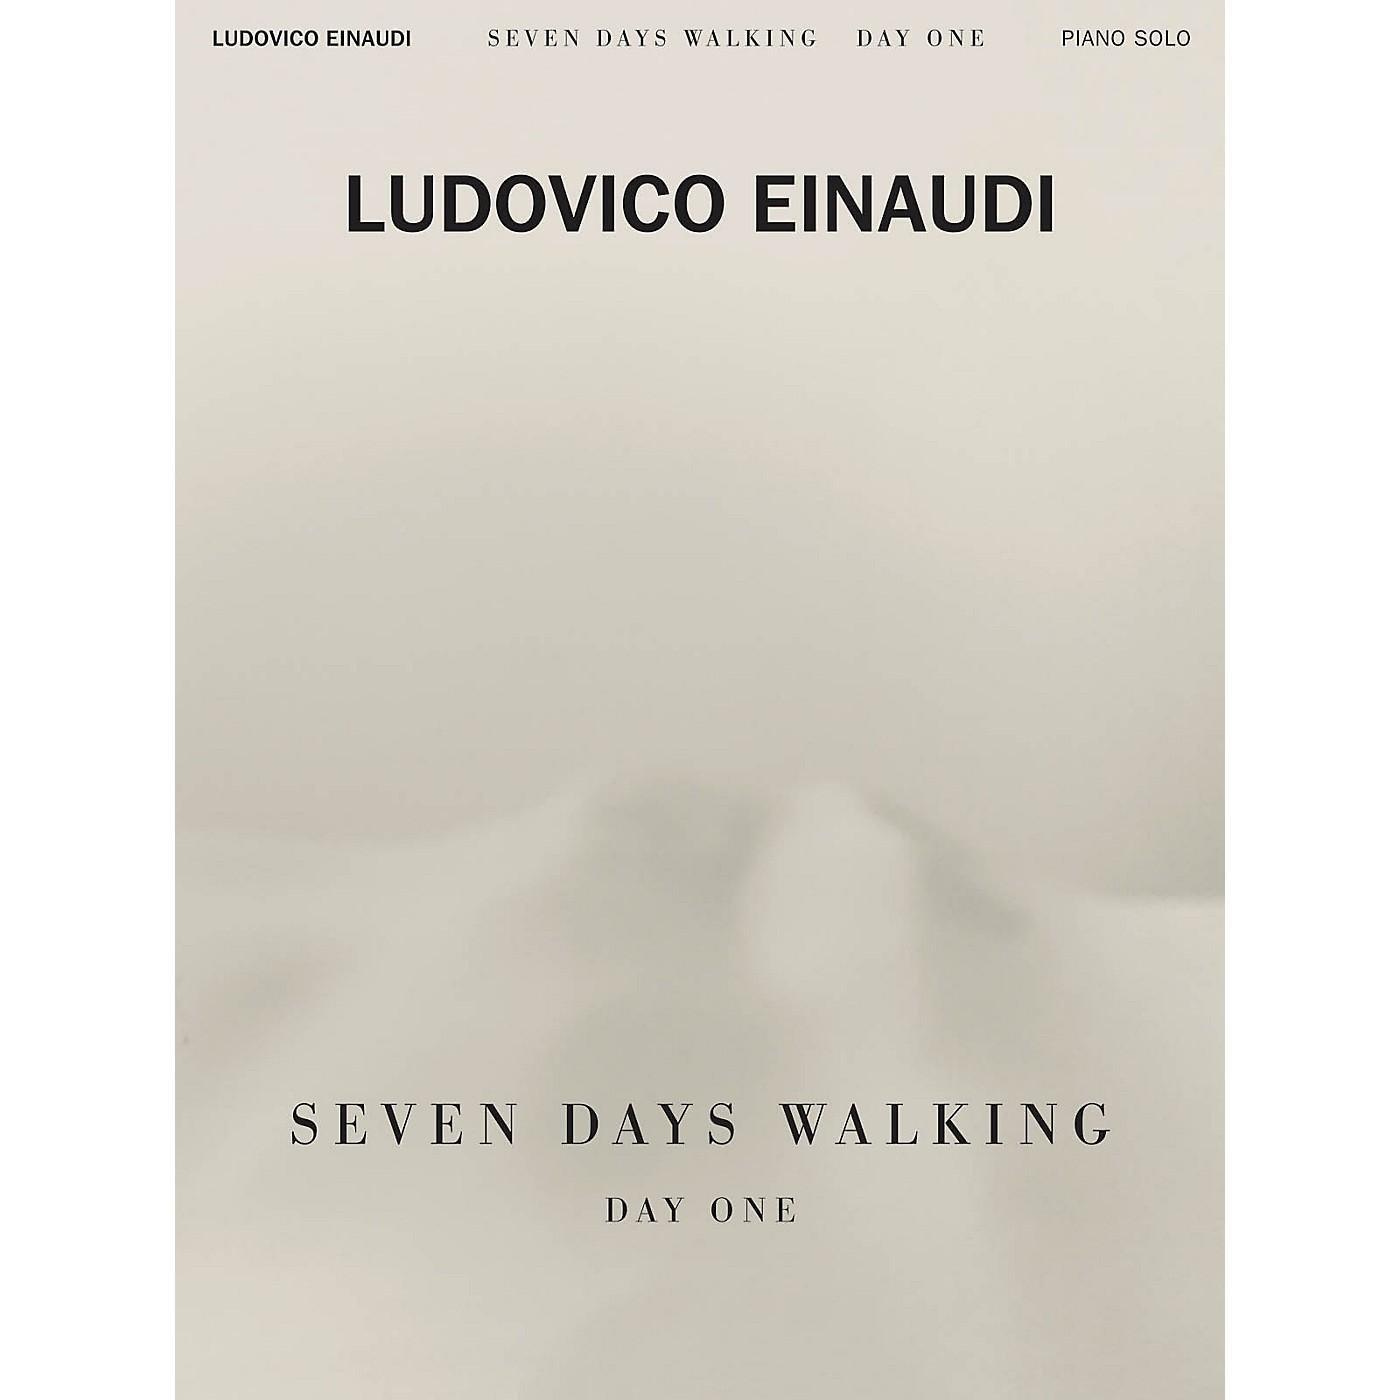 Hal Leonard Ludovico Einaudi - Seven Days Walking: Day One for Piano thumbnail